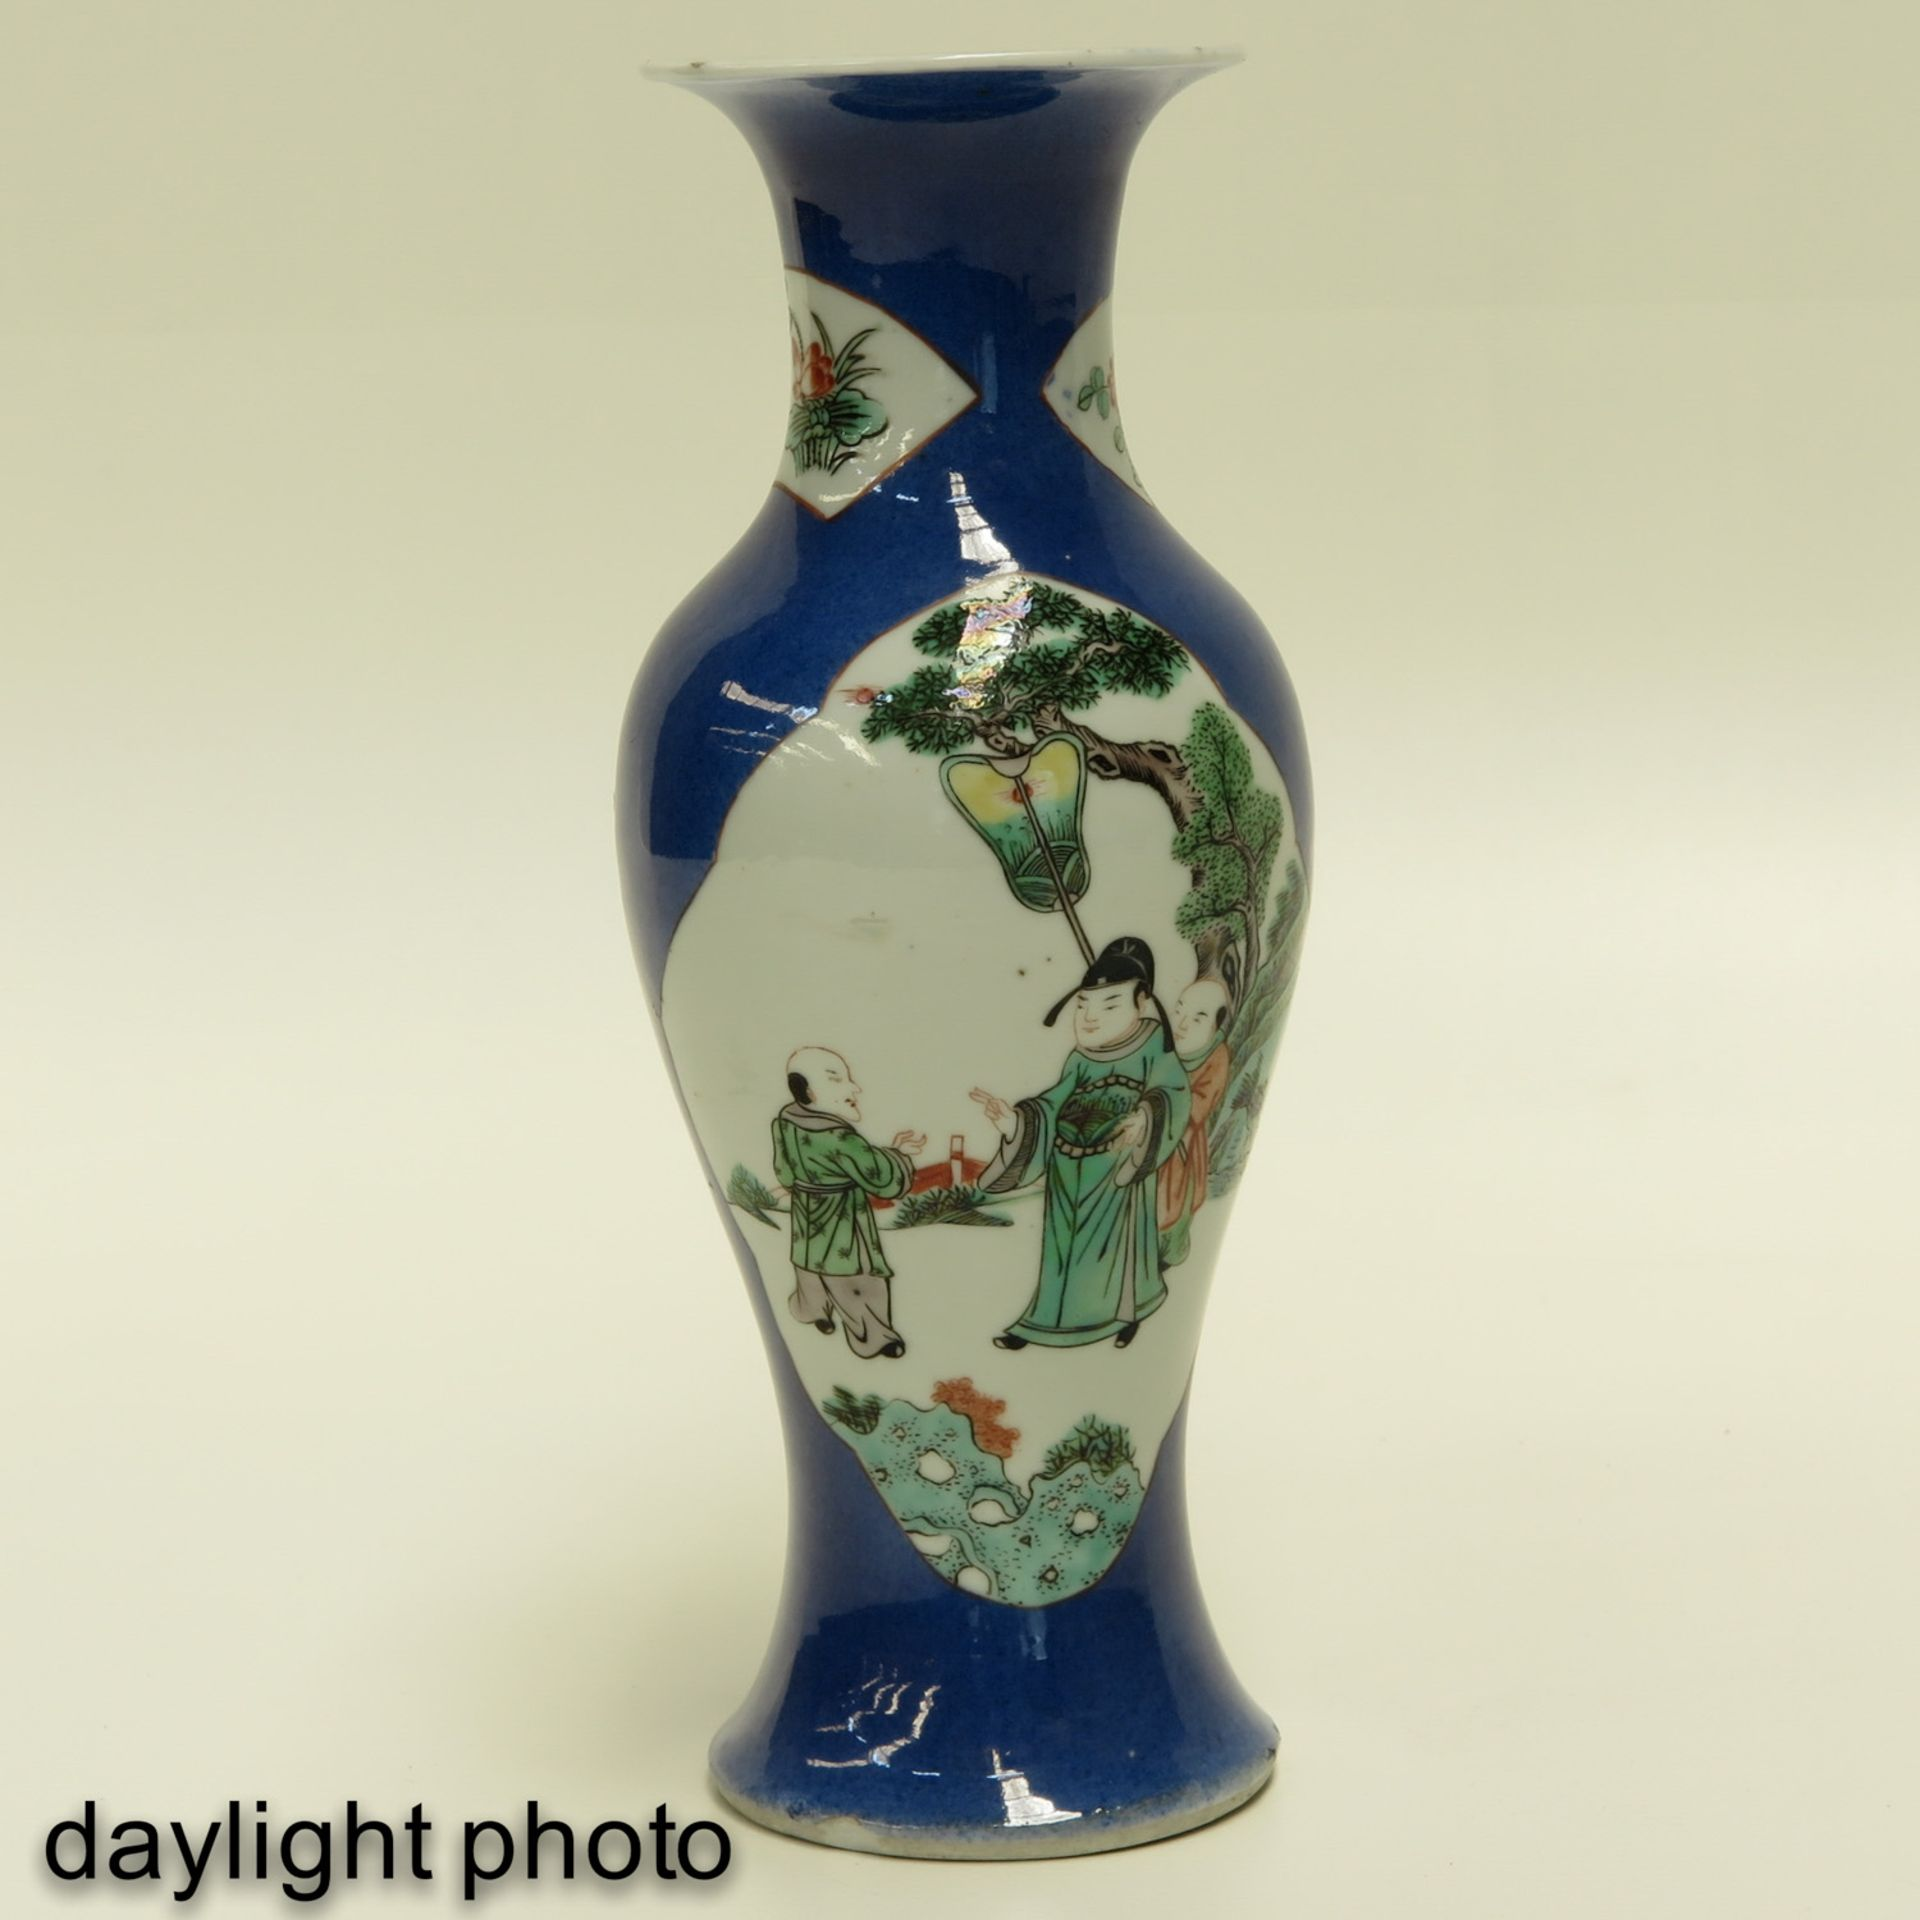 Los 7038 - A Pair of Powder Blue Vases